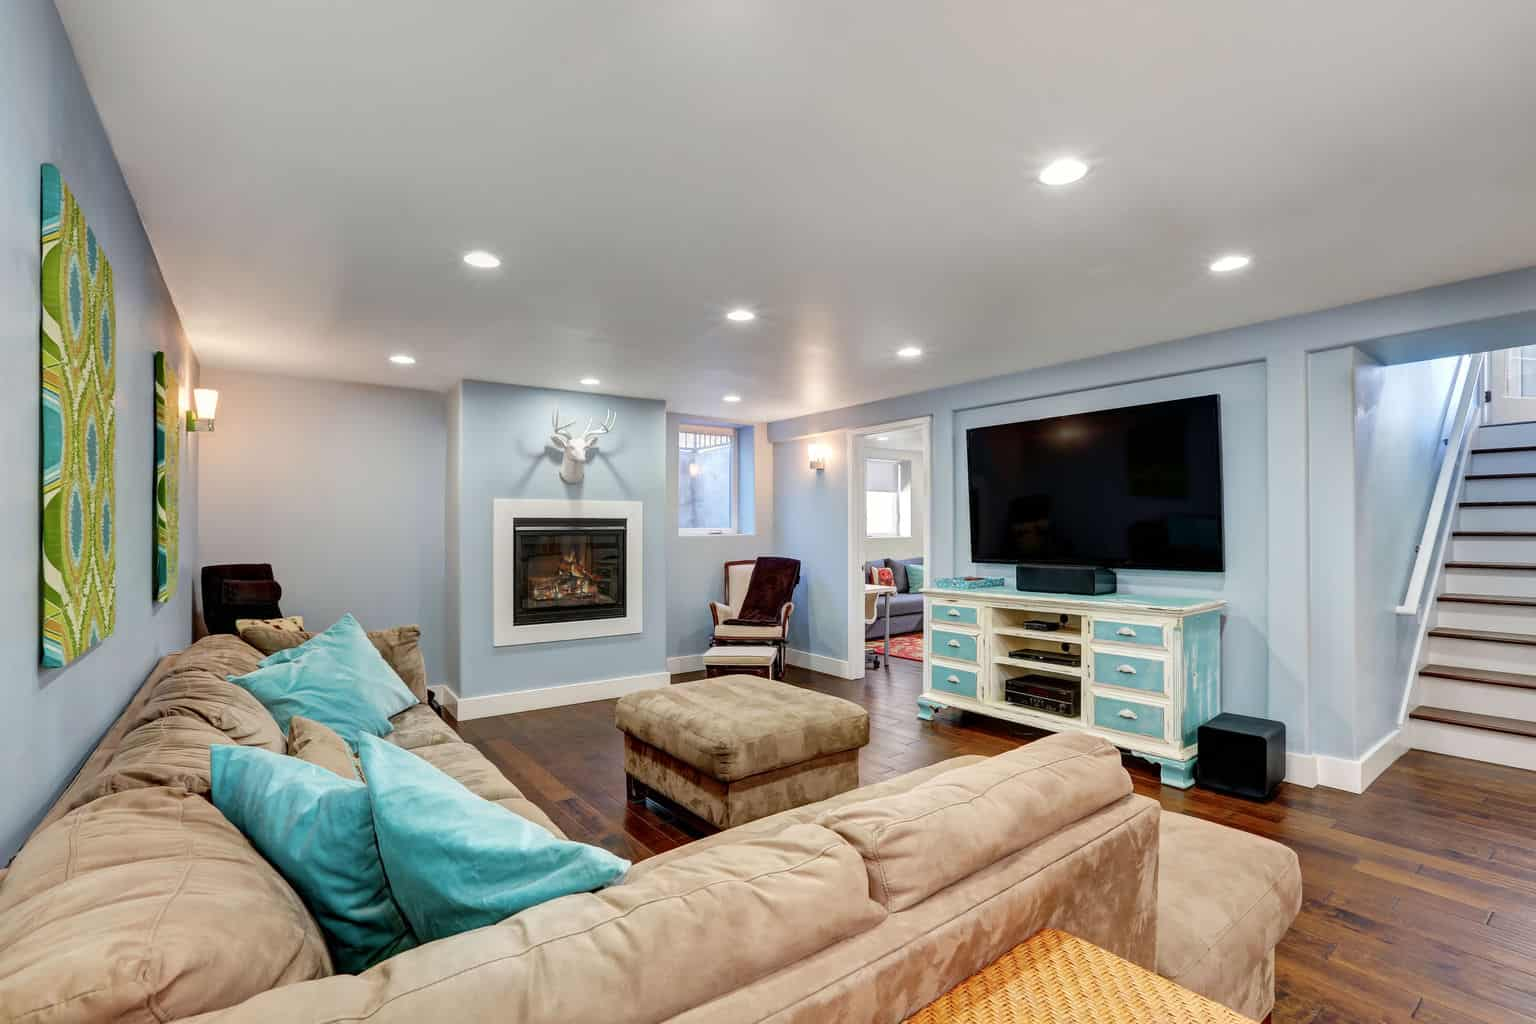 Basement Floors Best Options for a Basement Floor That Lasts